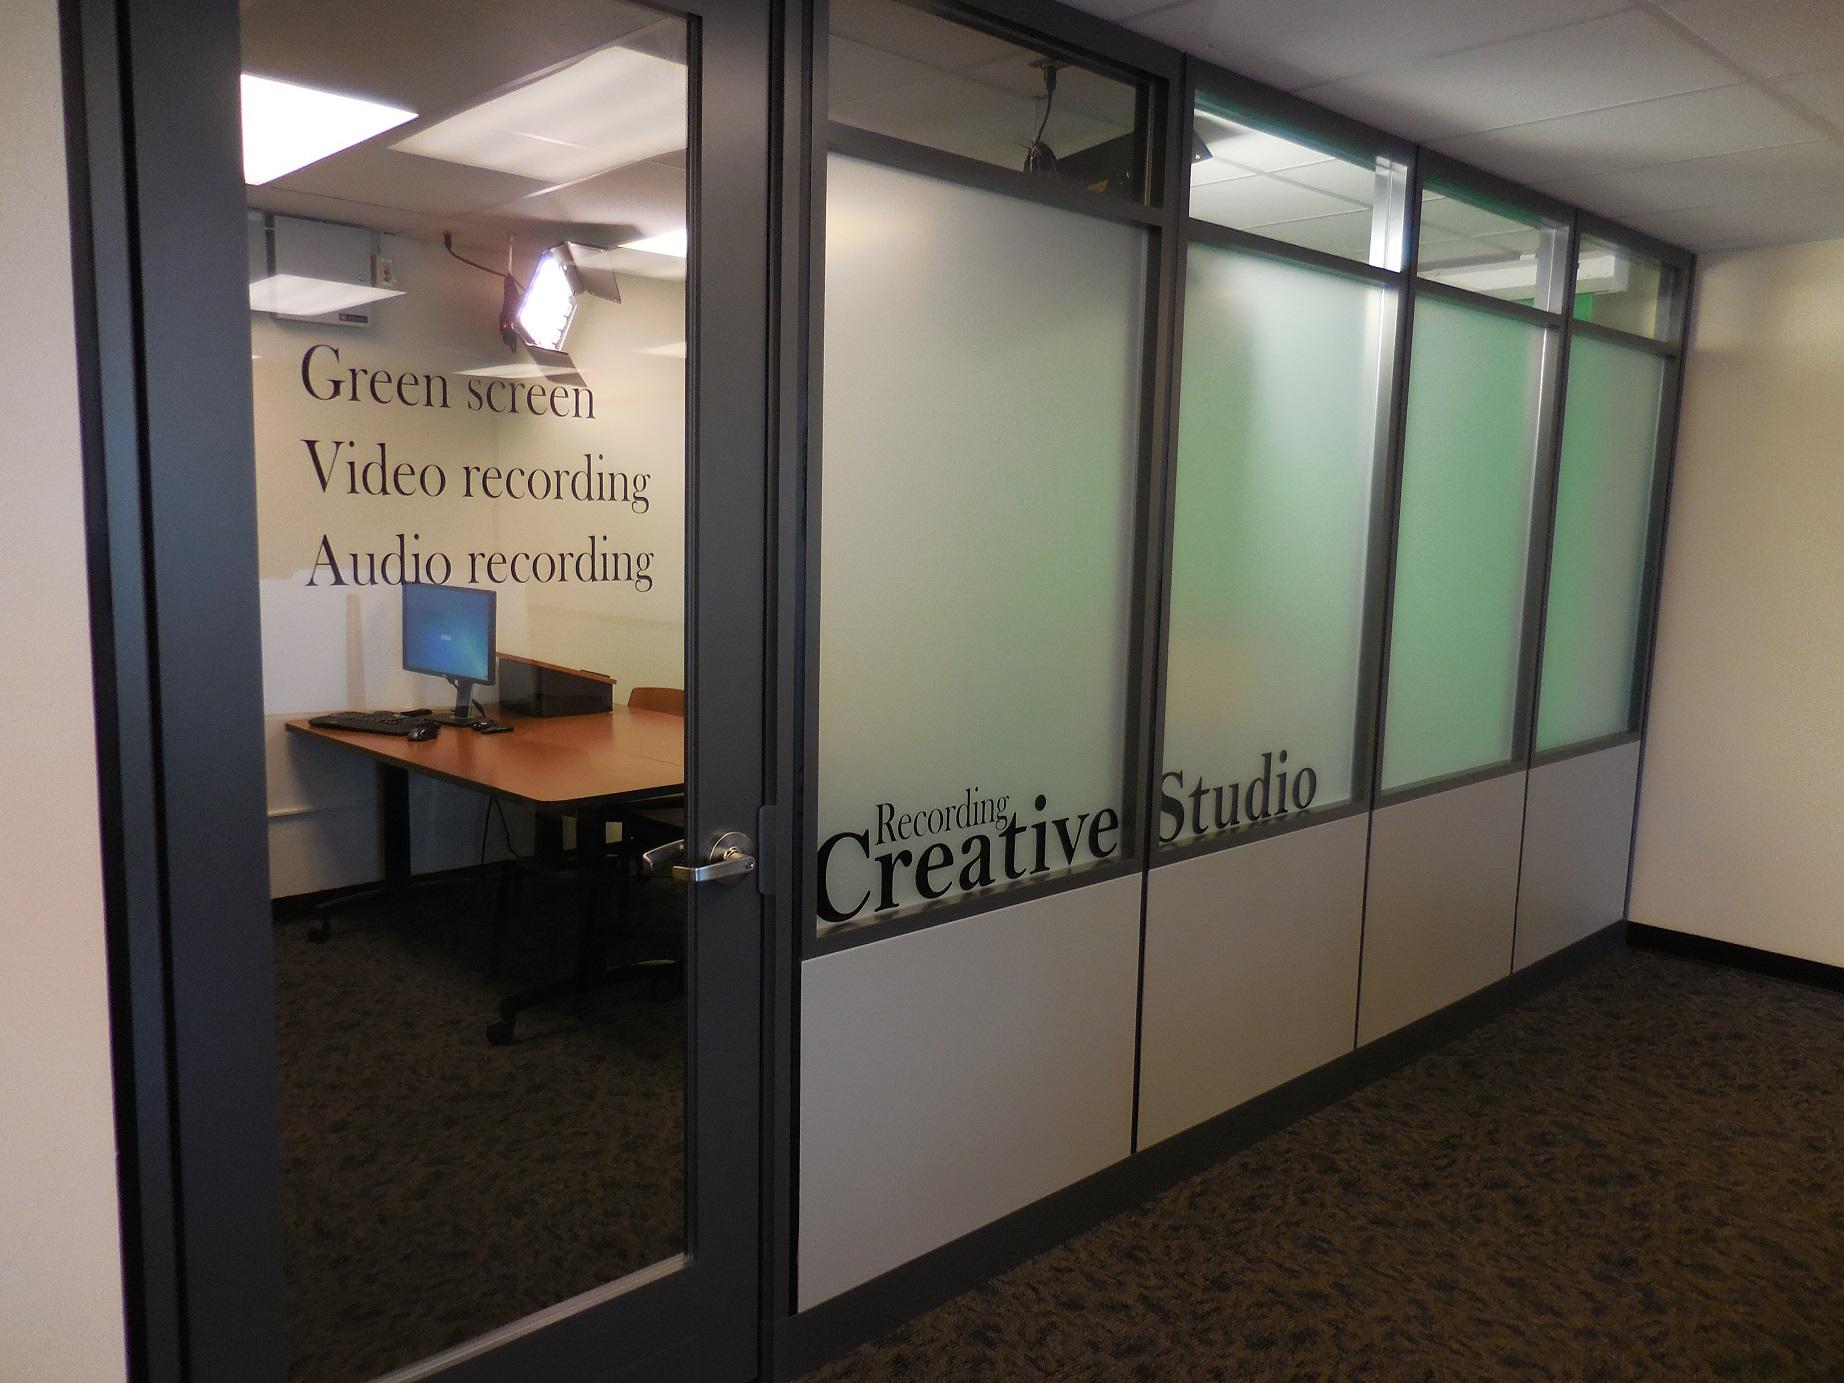 Groovy Recording And Presentation Studio Edmon Low Creative Studios Largest Home Design Picture Inspirations Pitcheantrous